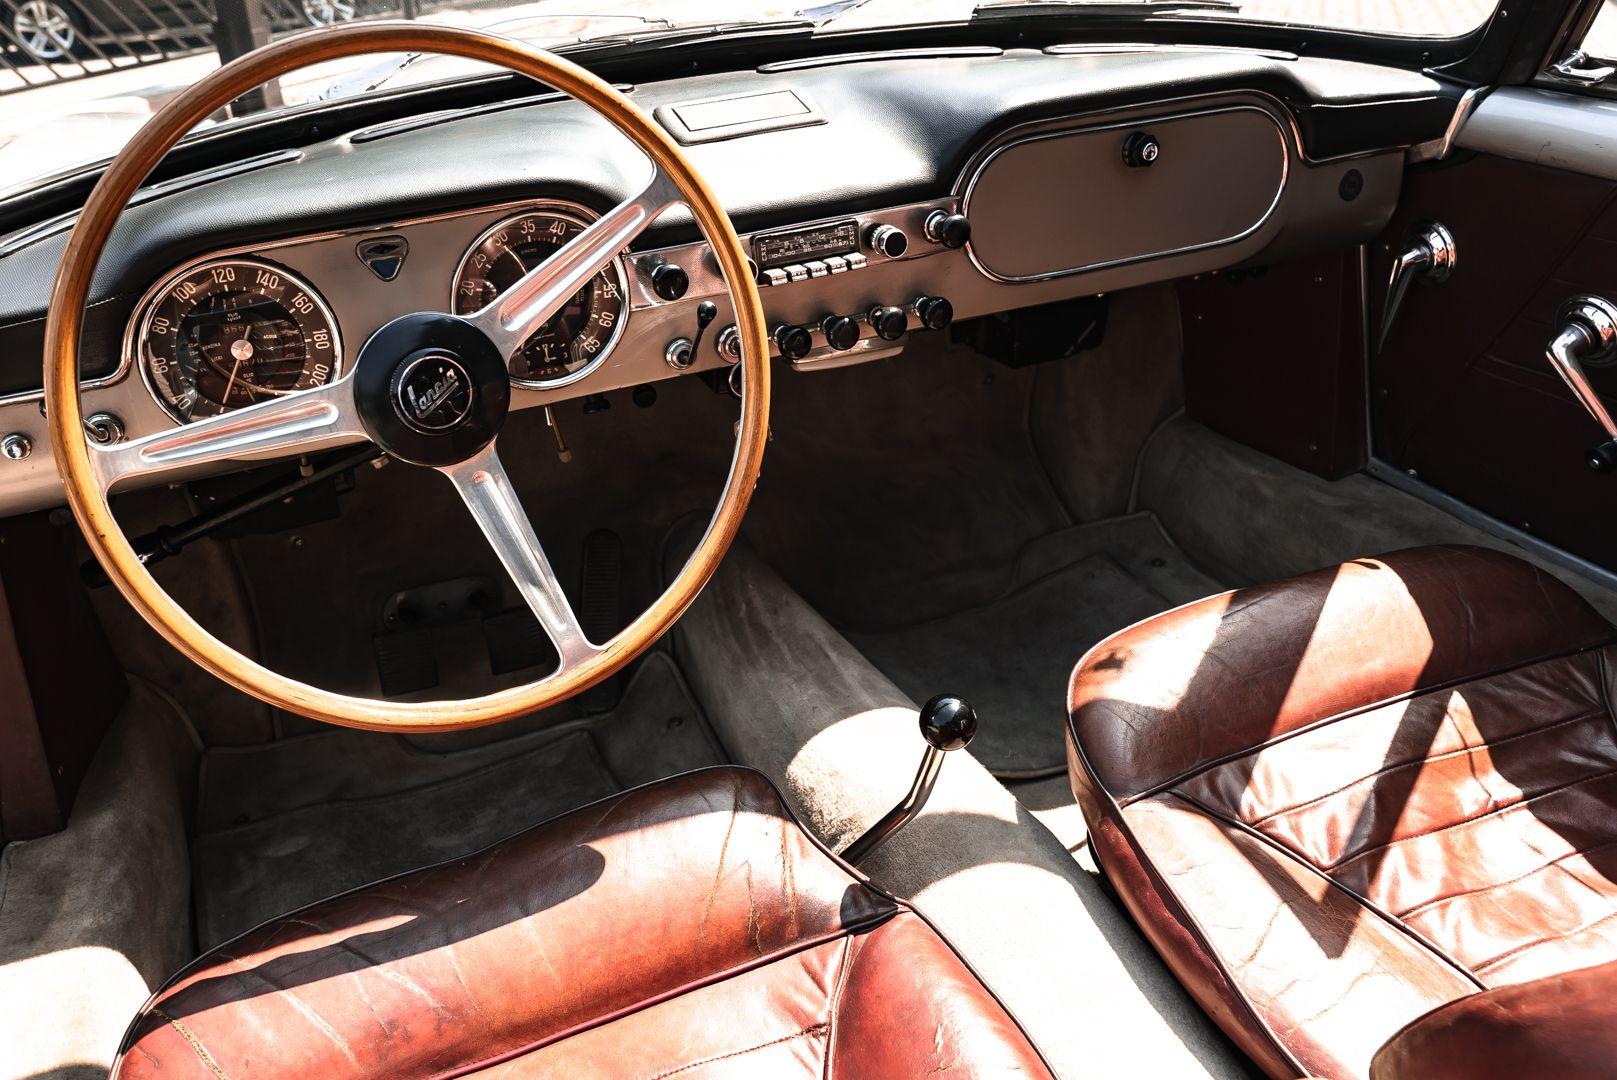 1963 Lancia Flaminia Touring Convertible 2500 3C  73164